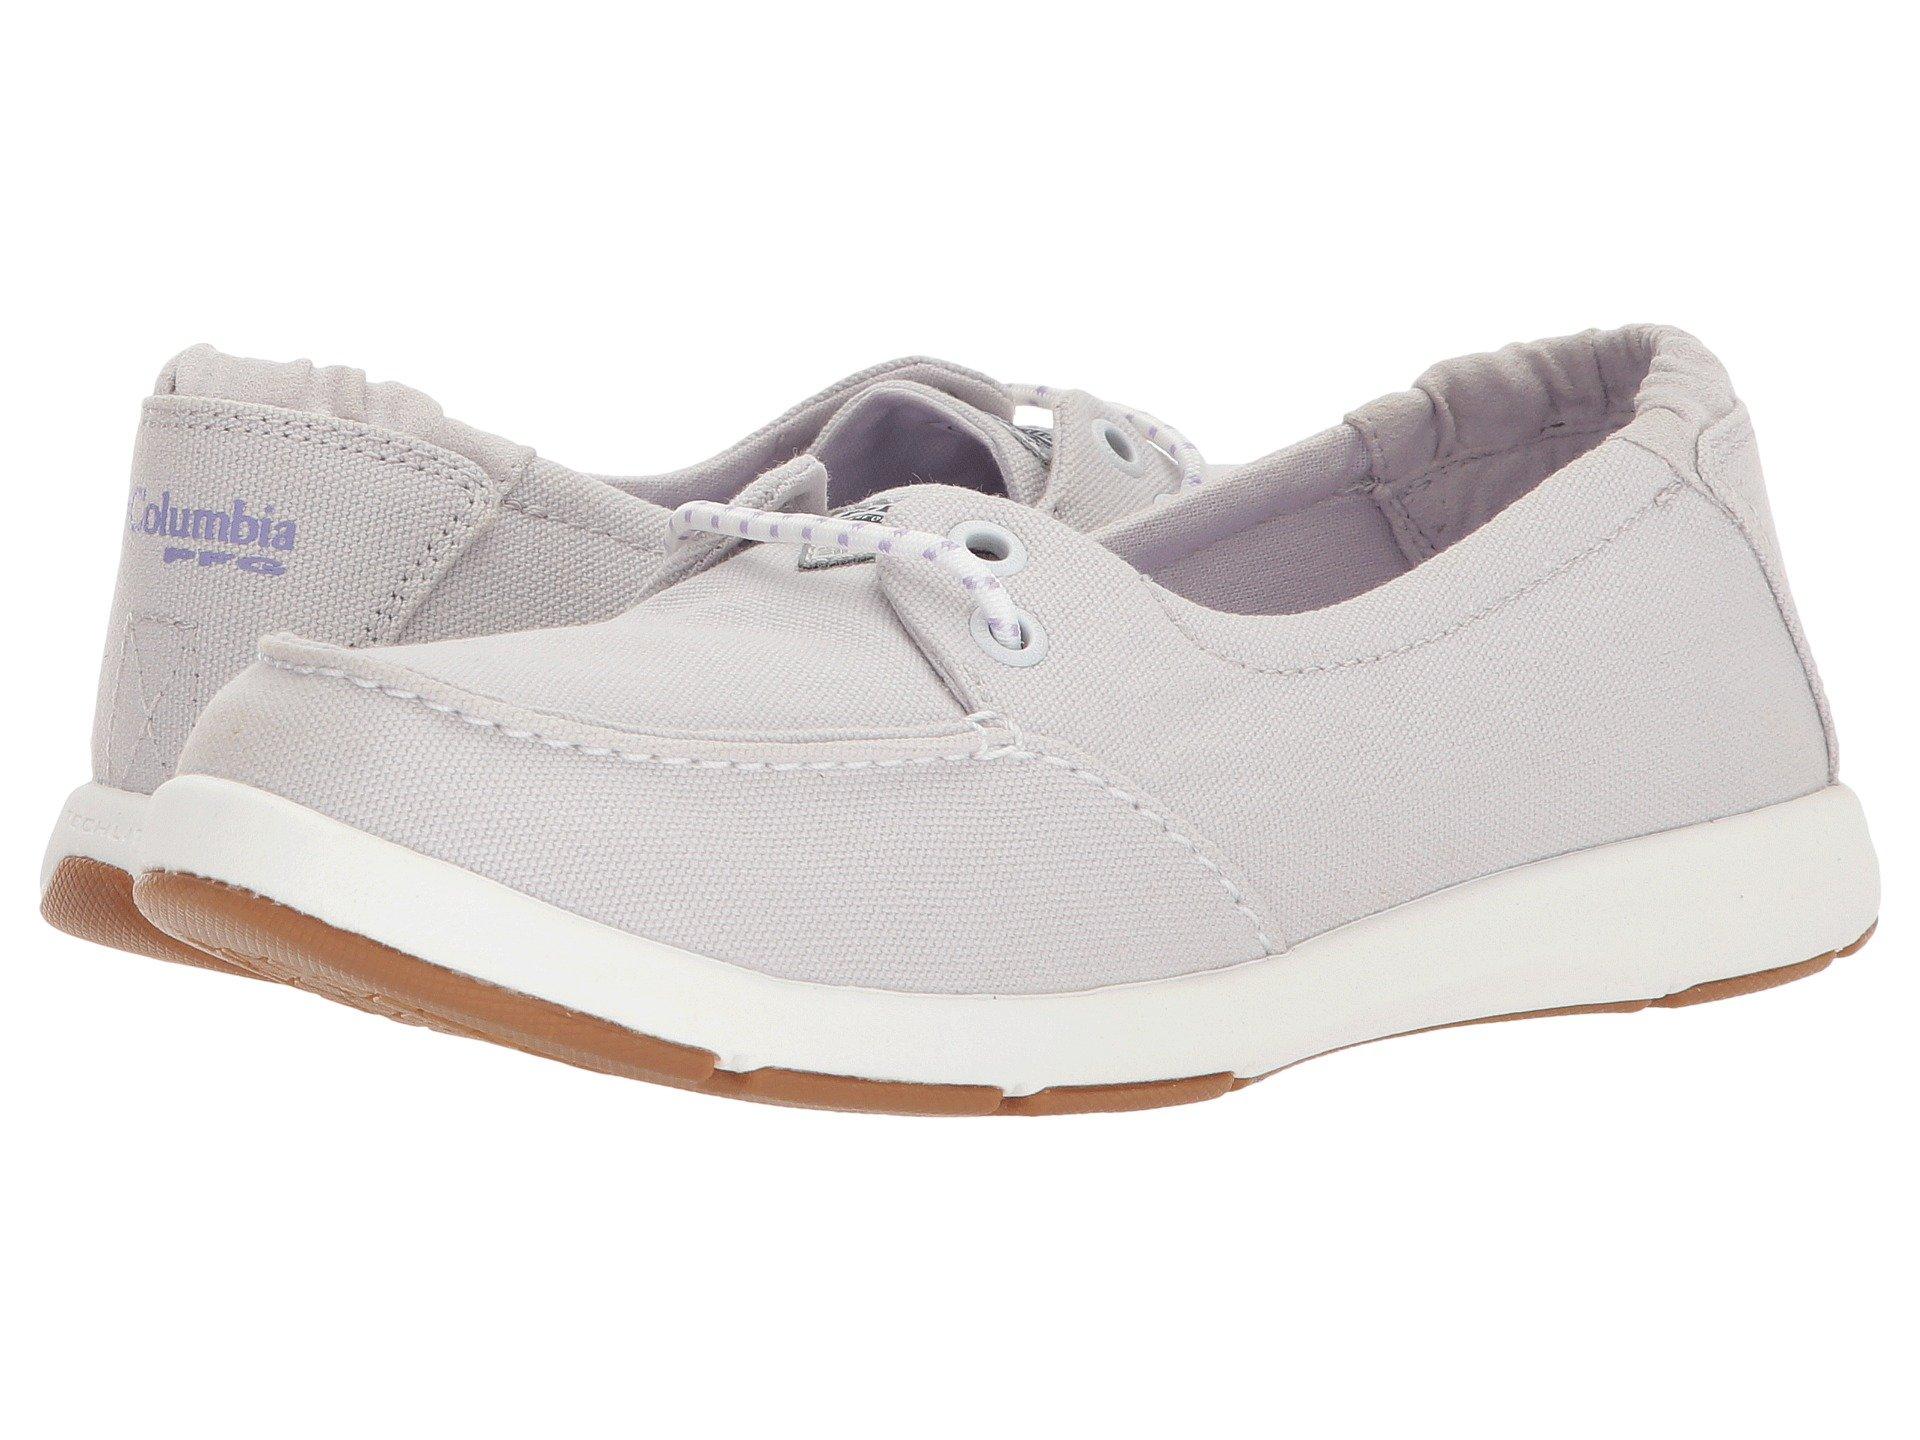 Boat Shoes para Mujer Columbia Delray PFG  + Columbia en VeoyCompro.net